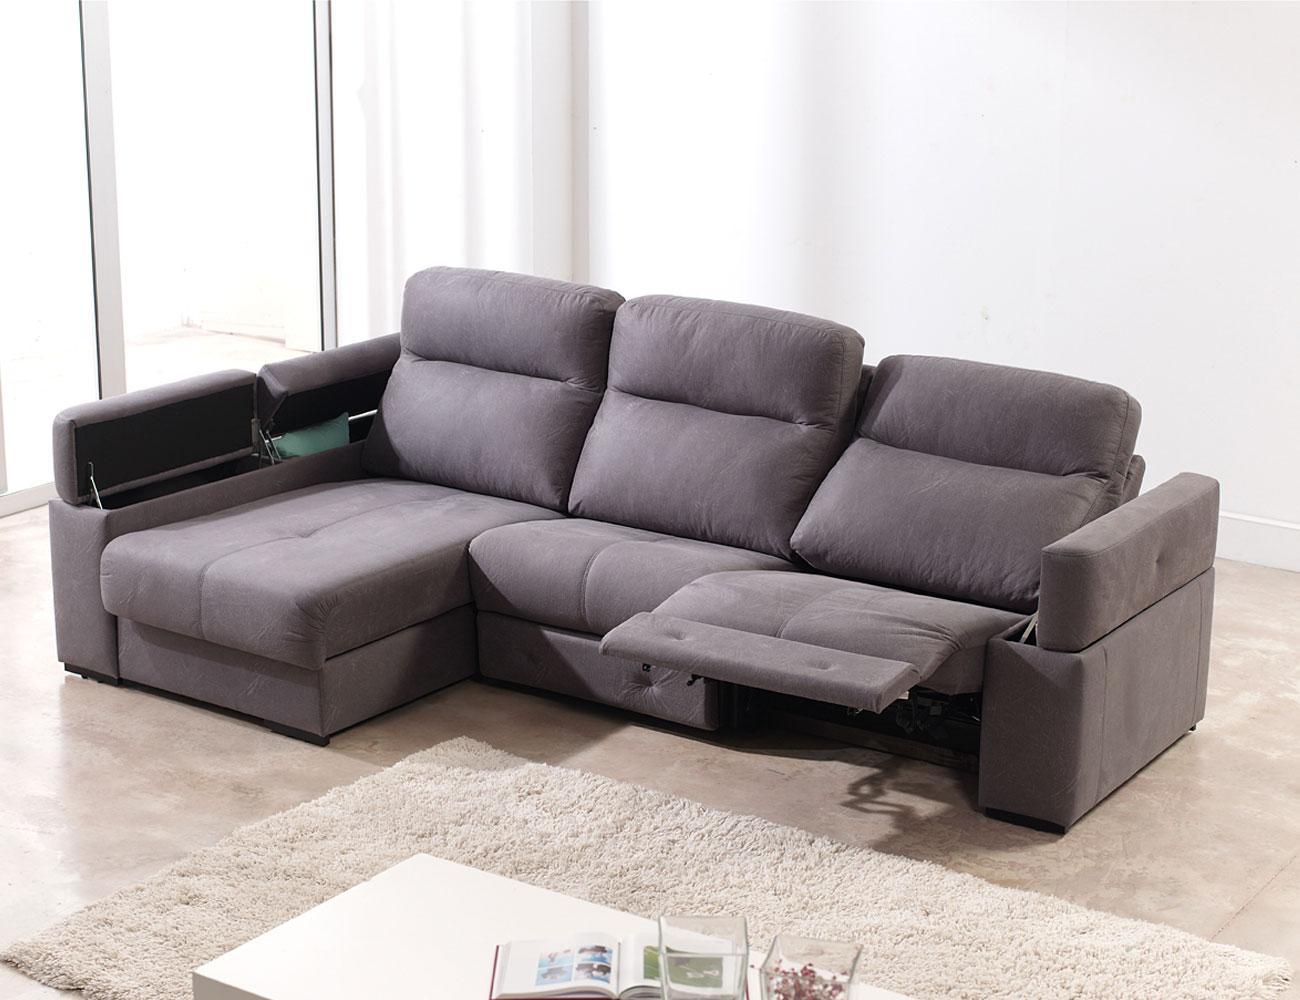 Sofa chaiselongue relax motor electrico 3 arcon 115